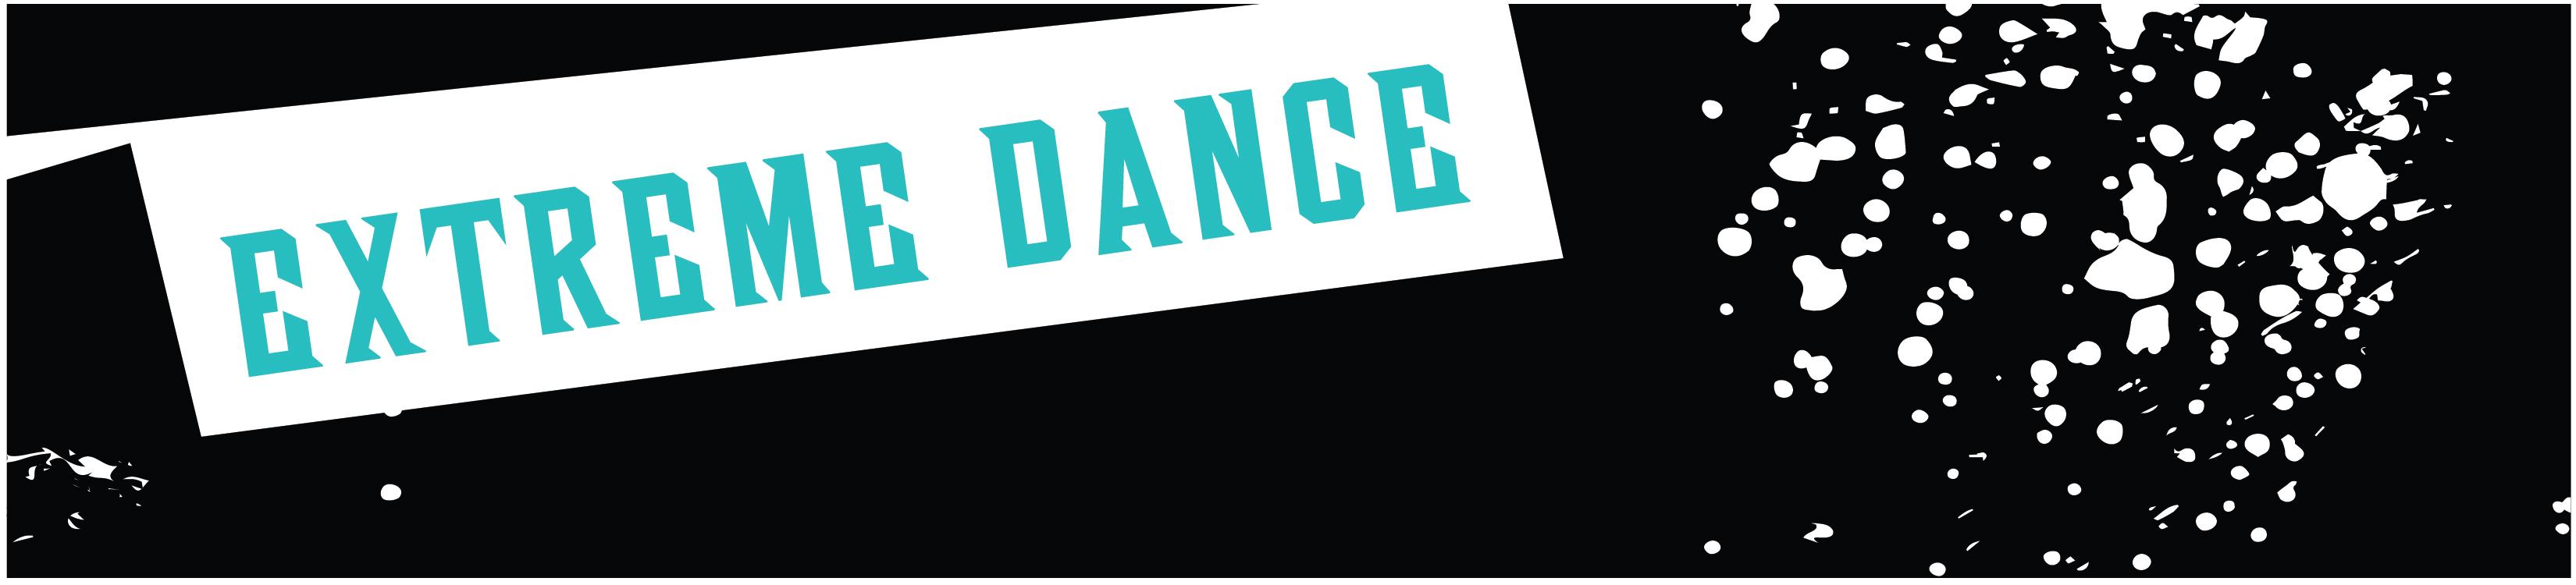 Extreme Dance Arts